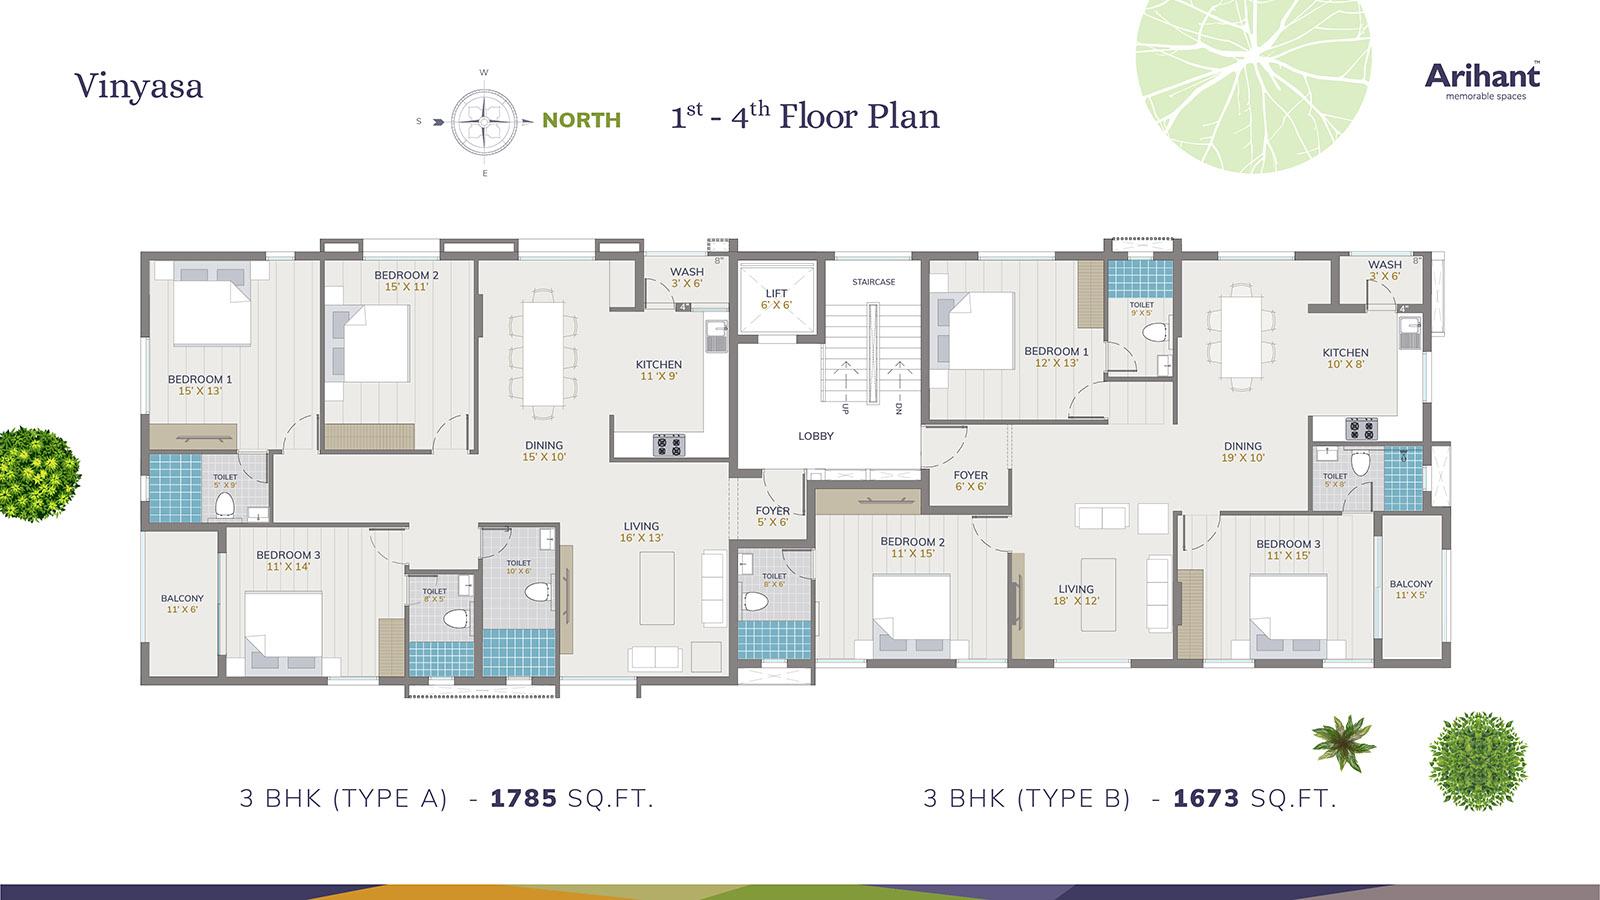 Arihant Vinyasa Typical Floor